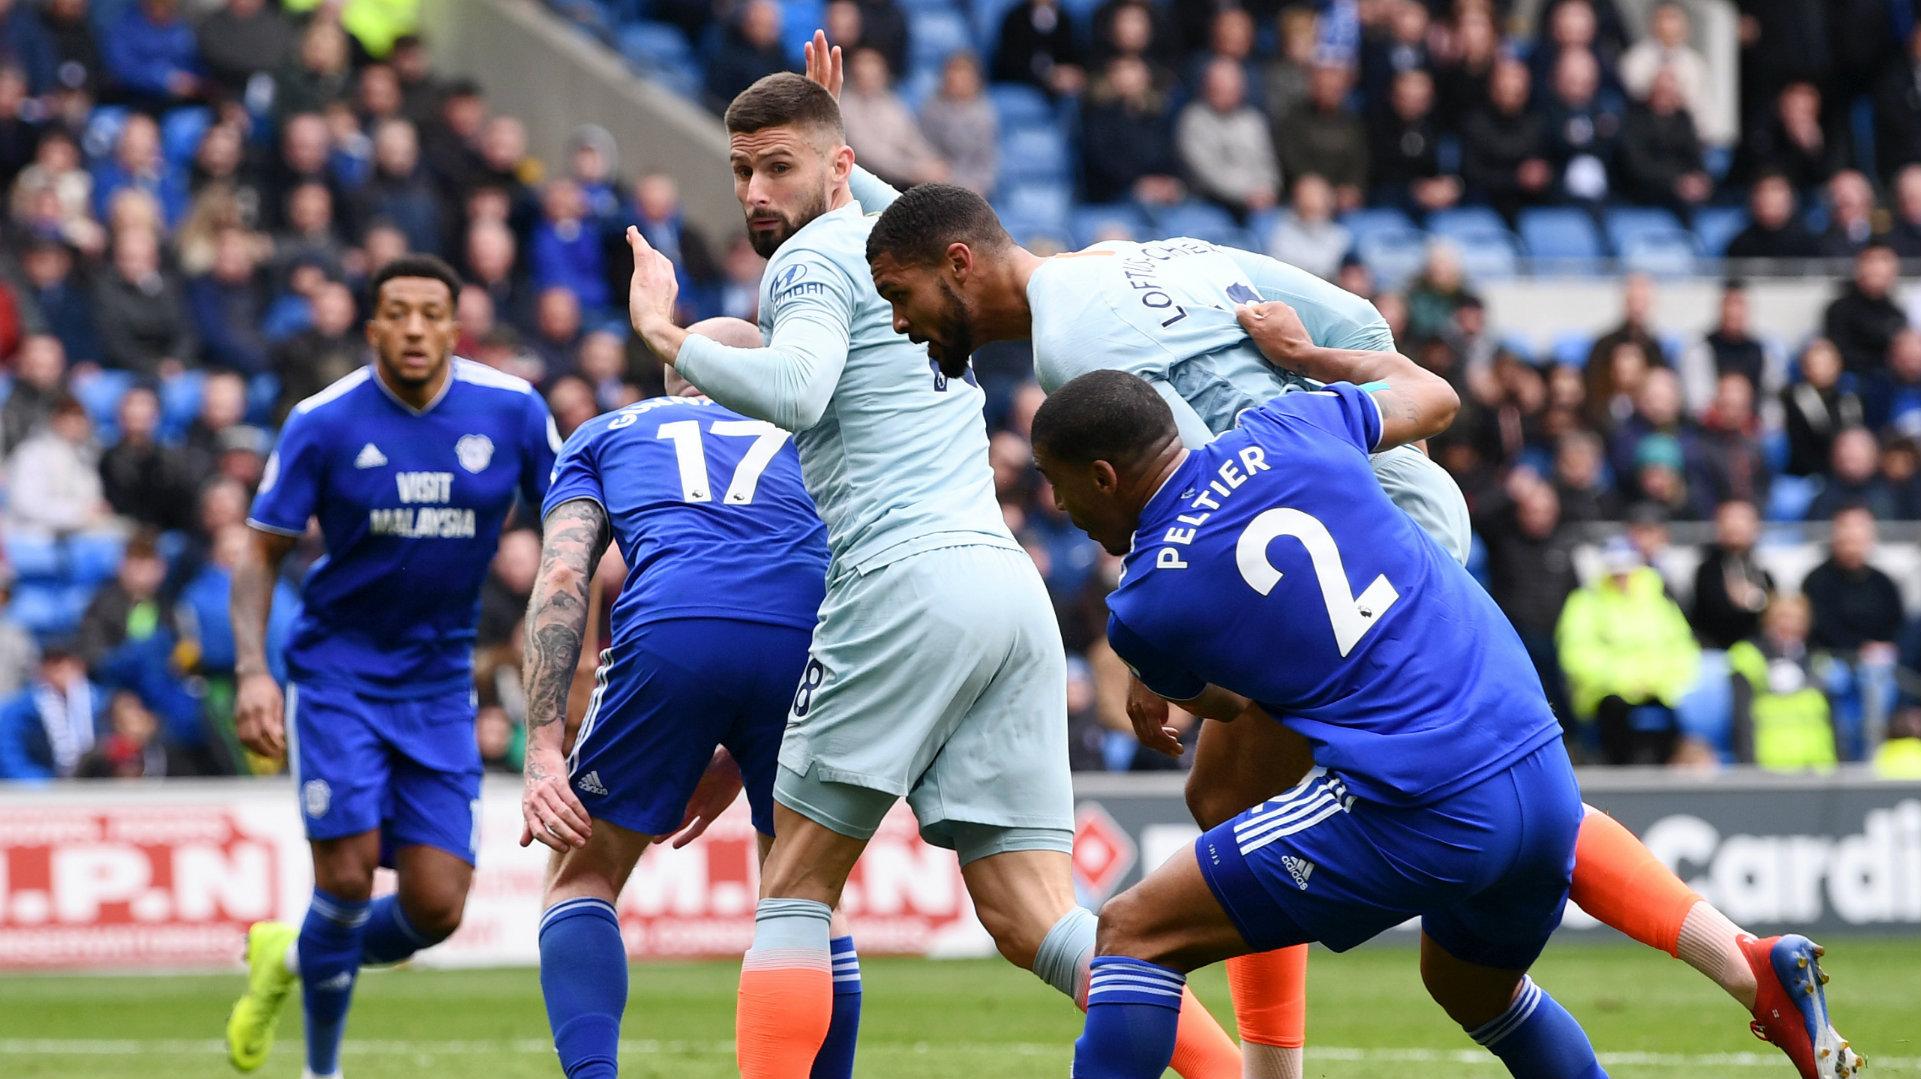 Ruben Loftus-Cheek Cardiff vs Chelsea Premier League 2018-19